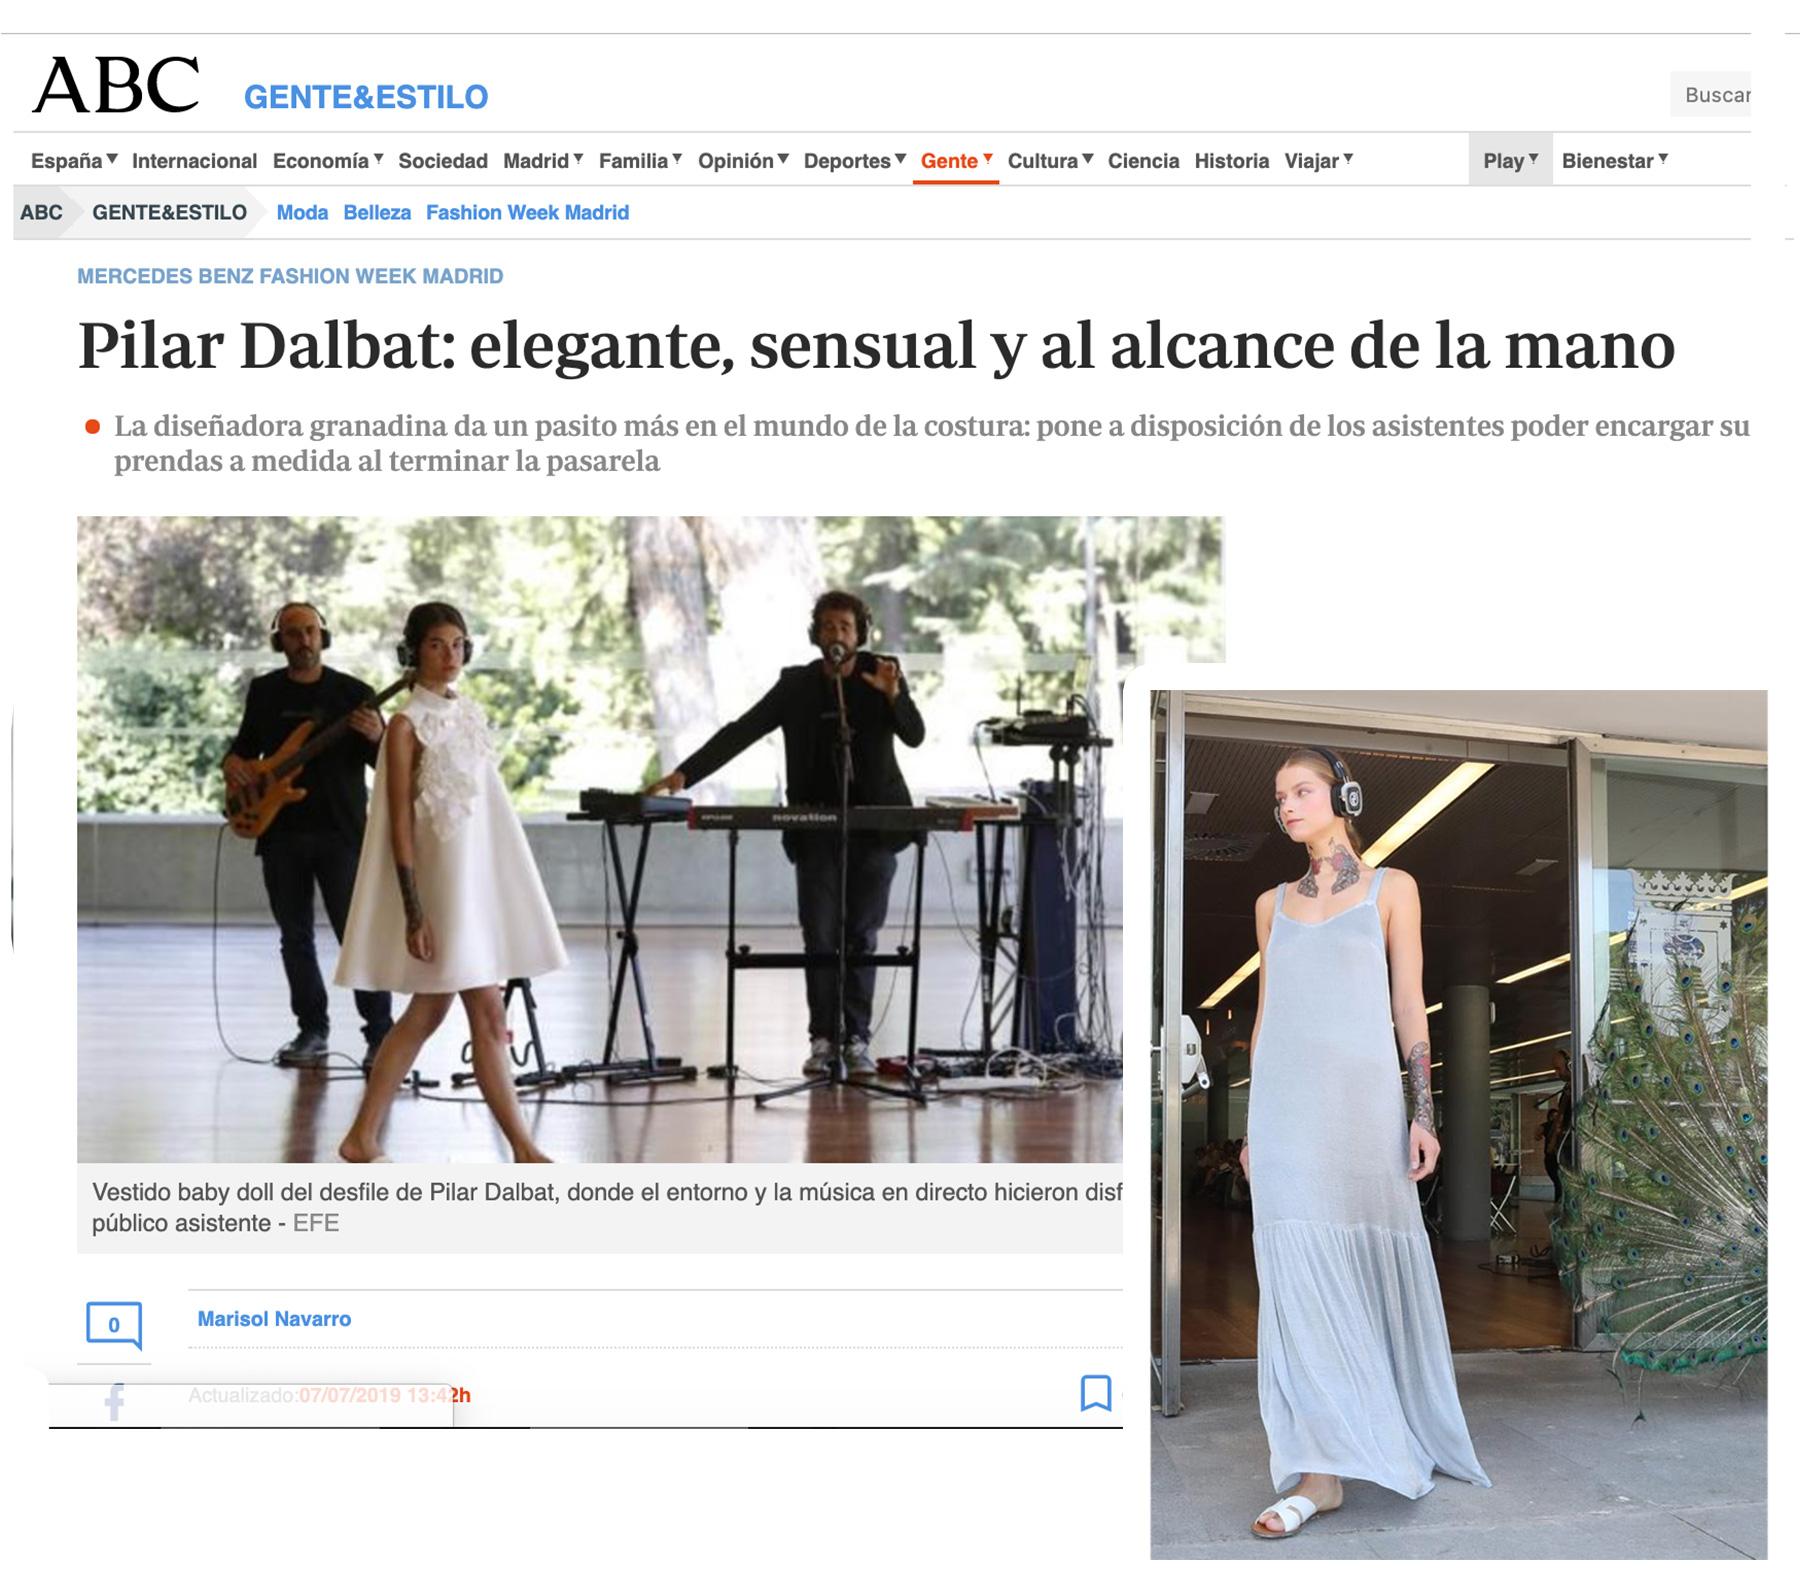 Pilar Dalbat - ACB